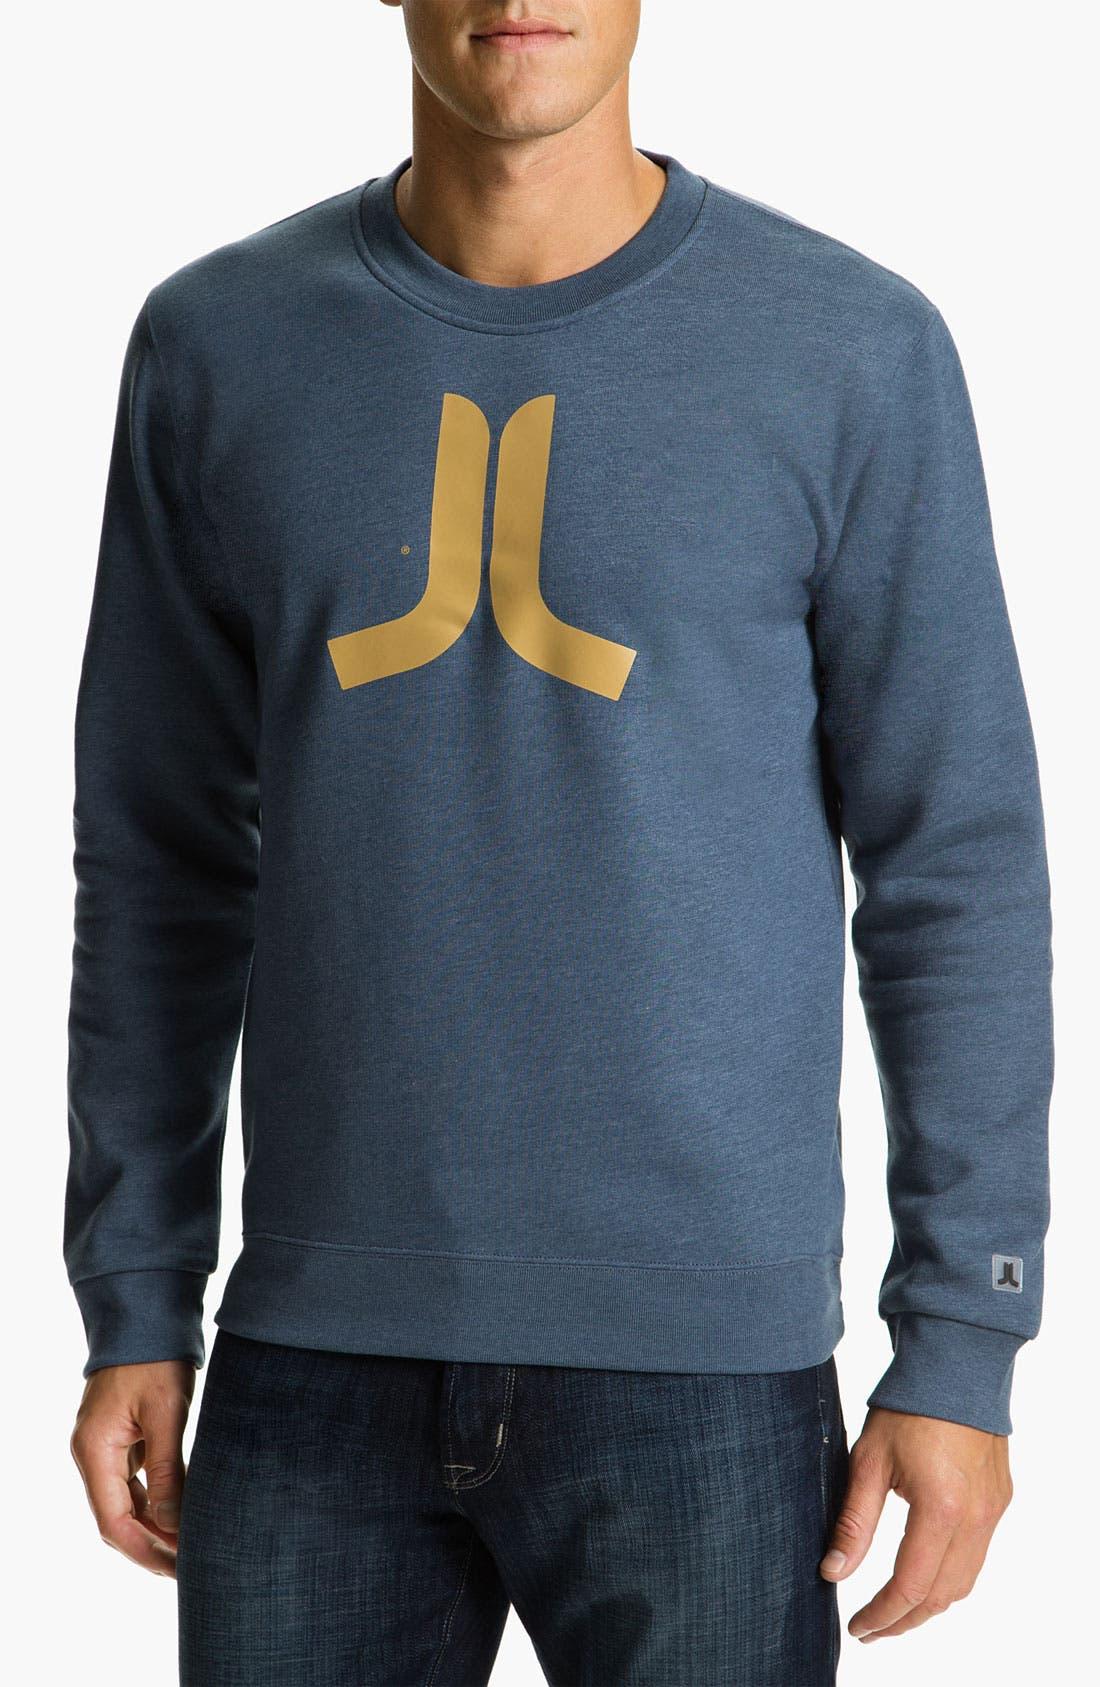 Alternate Image 1 Selected - WeSC 'Icon' Crewneck Sweatshirt